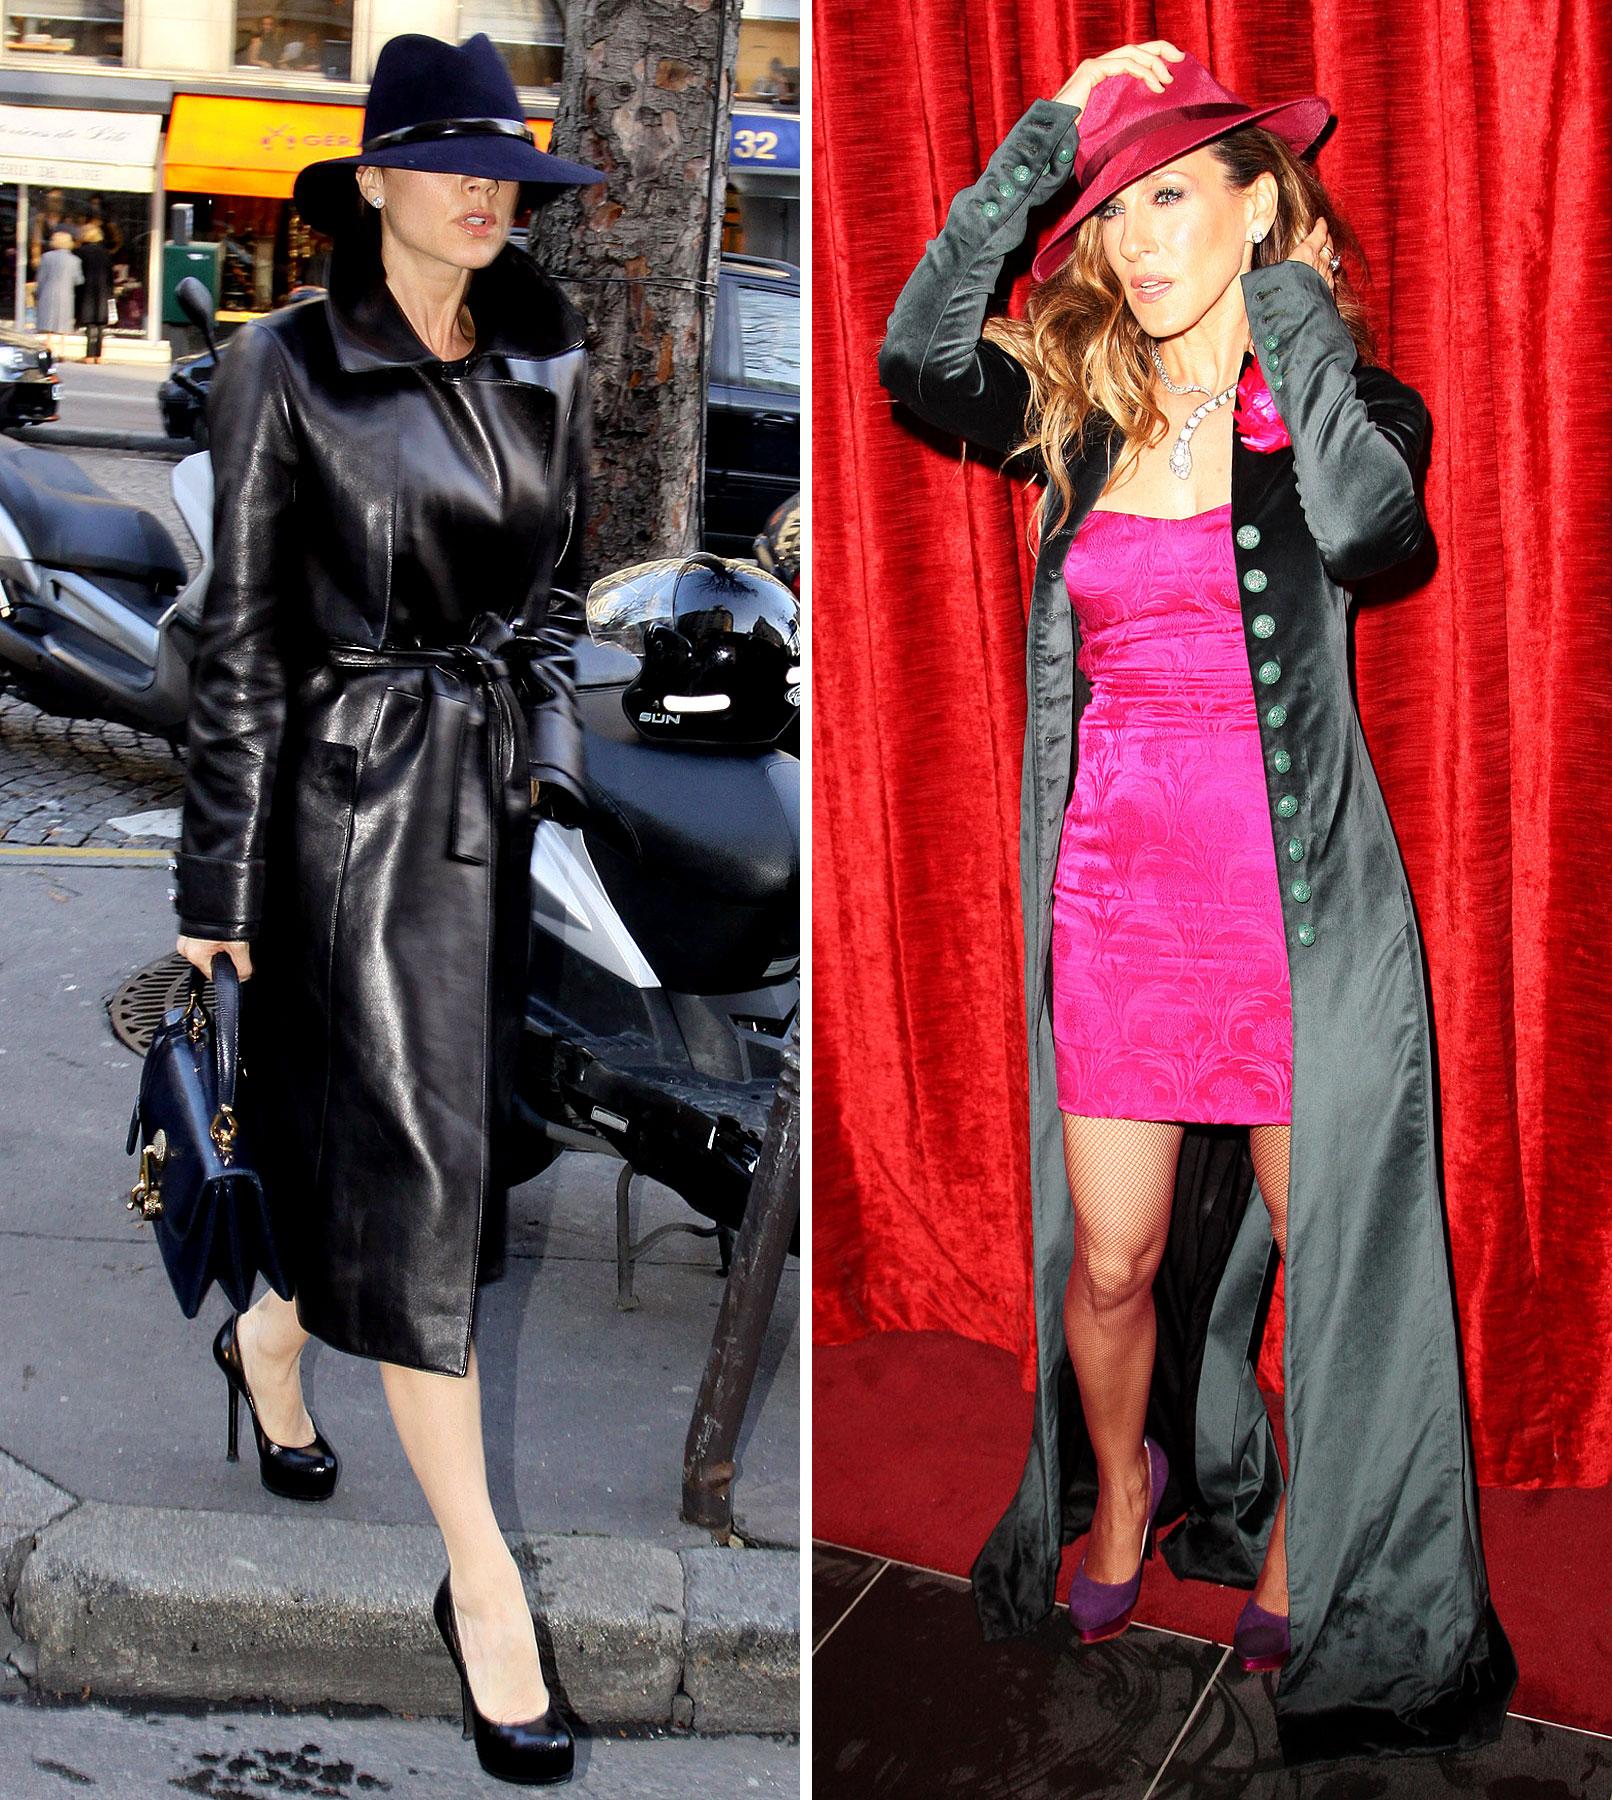 New Looks: Sarah Jessica and Posh Pioneer 'Sexy Carmen Sandiego'